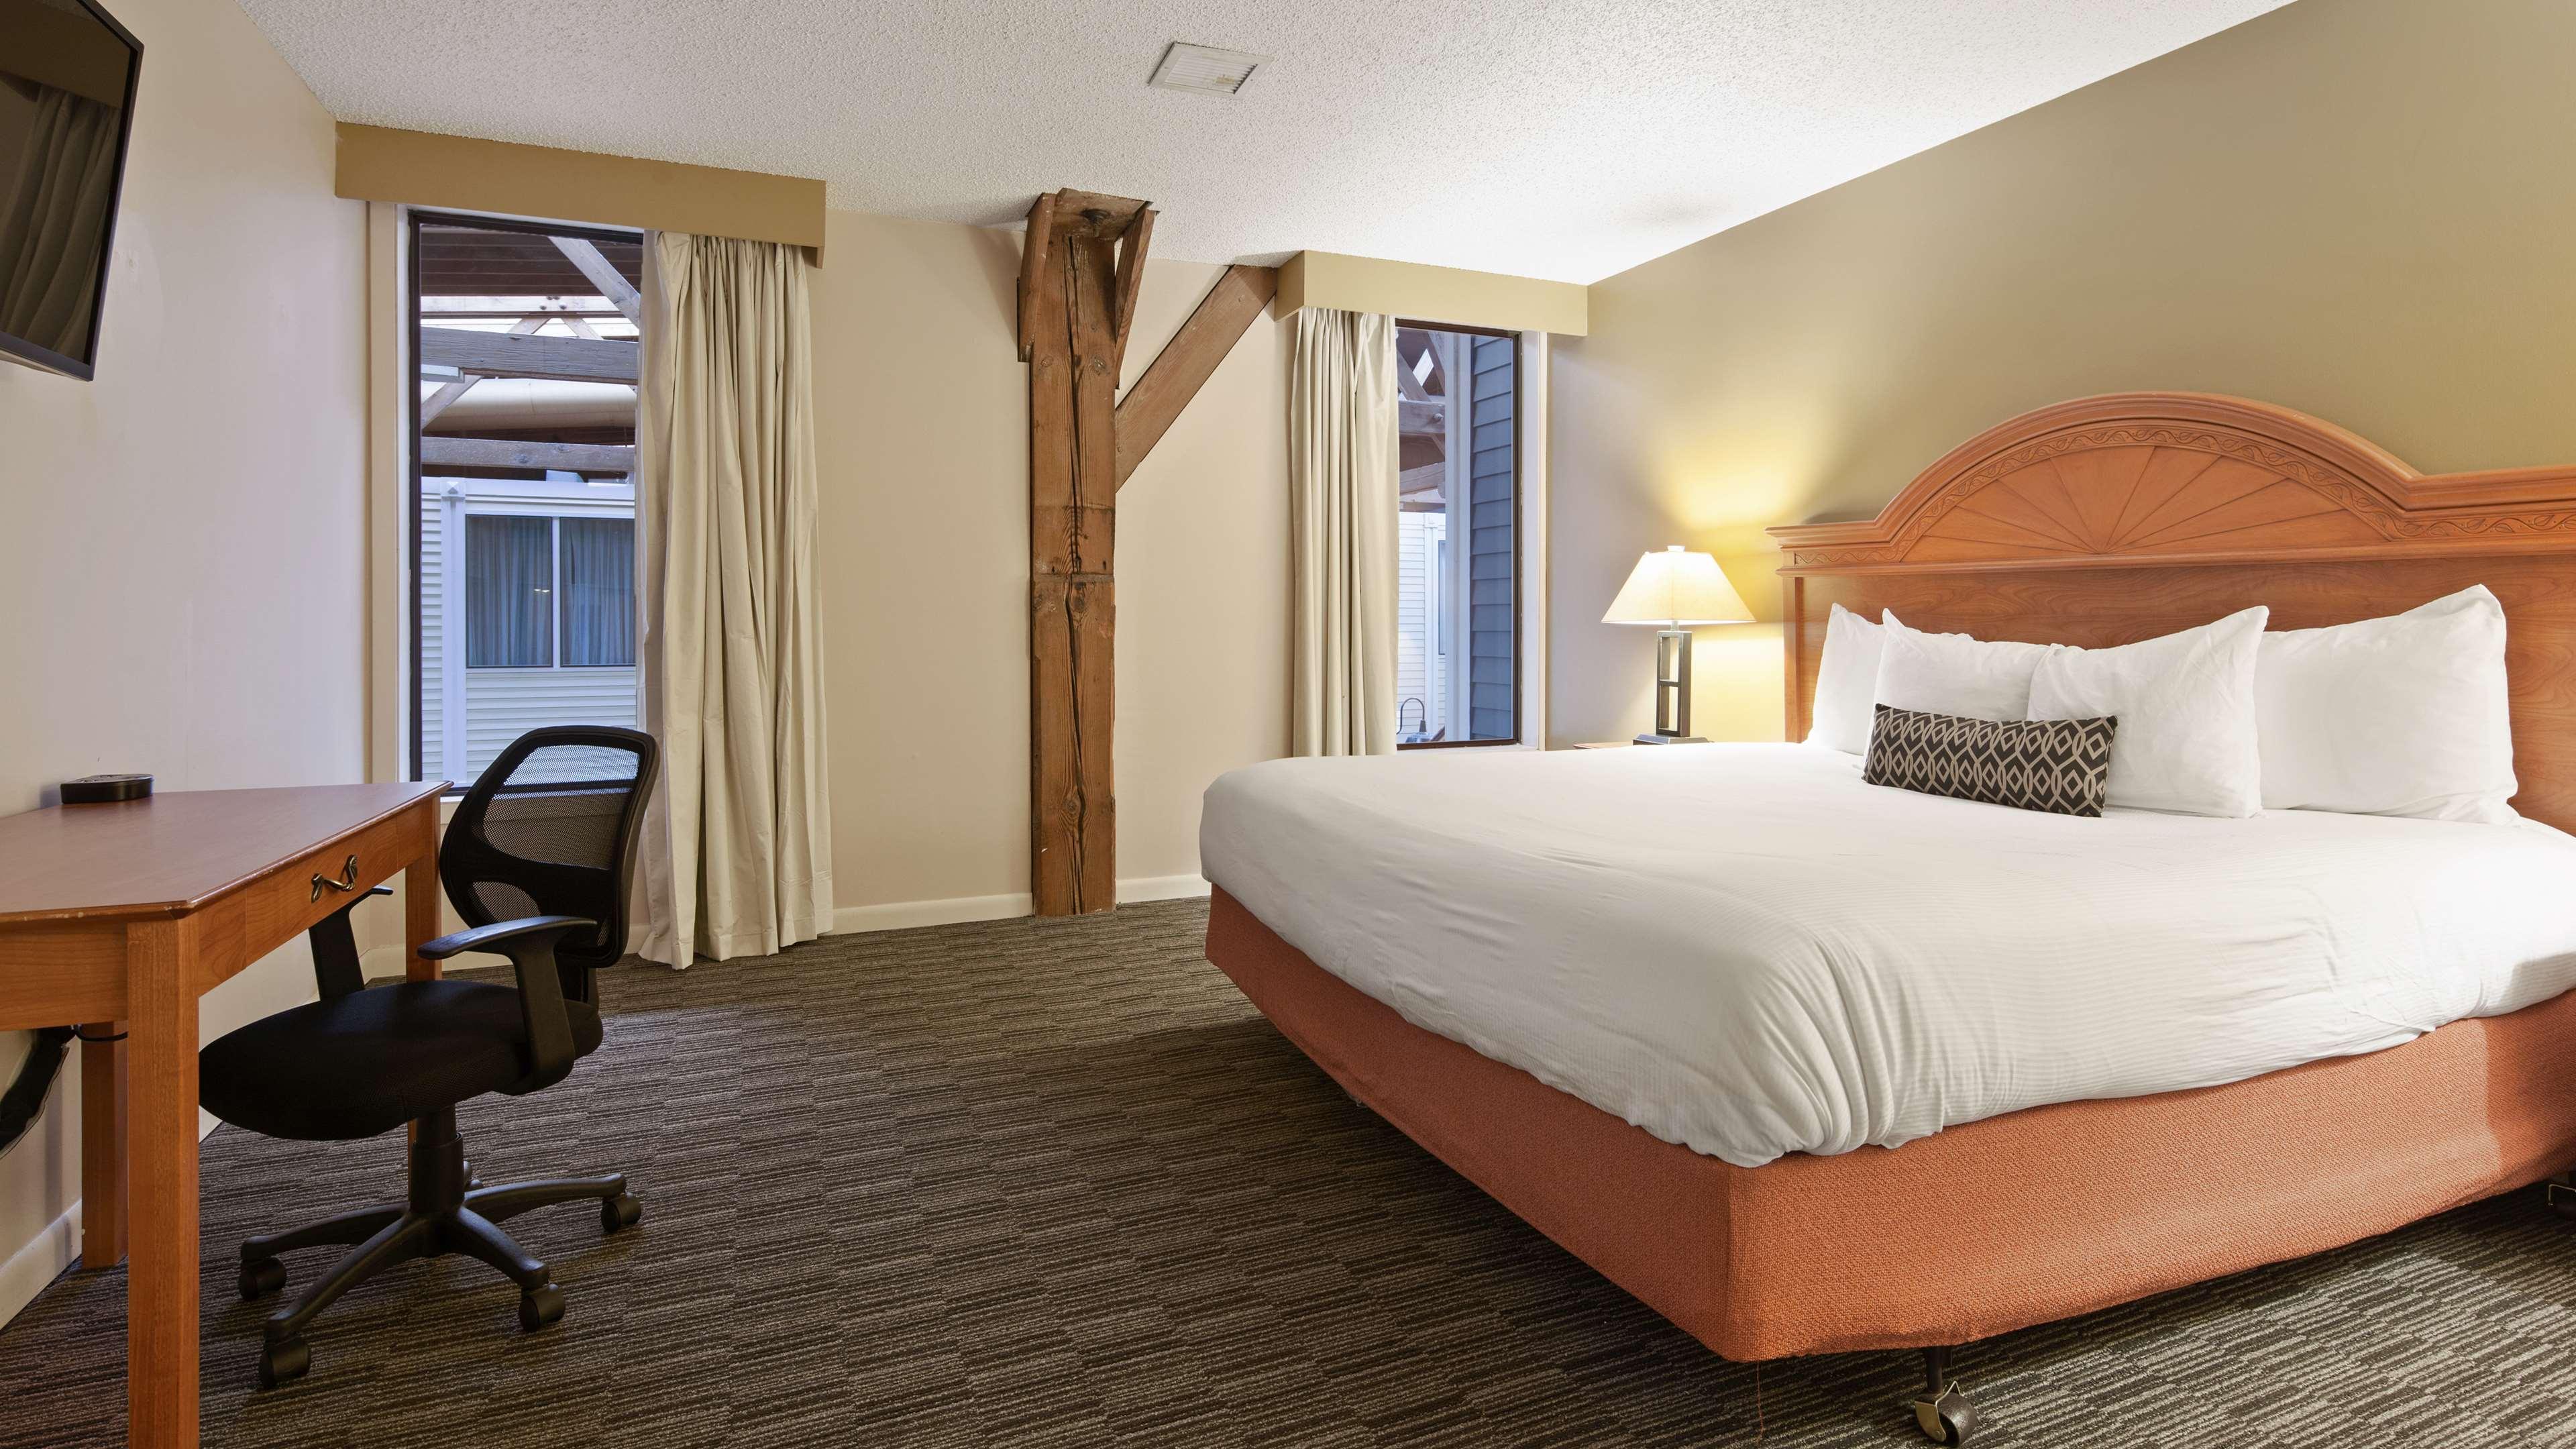 Best Western Plus Como Park Hotel image 18